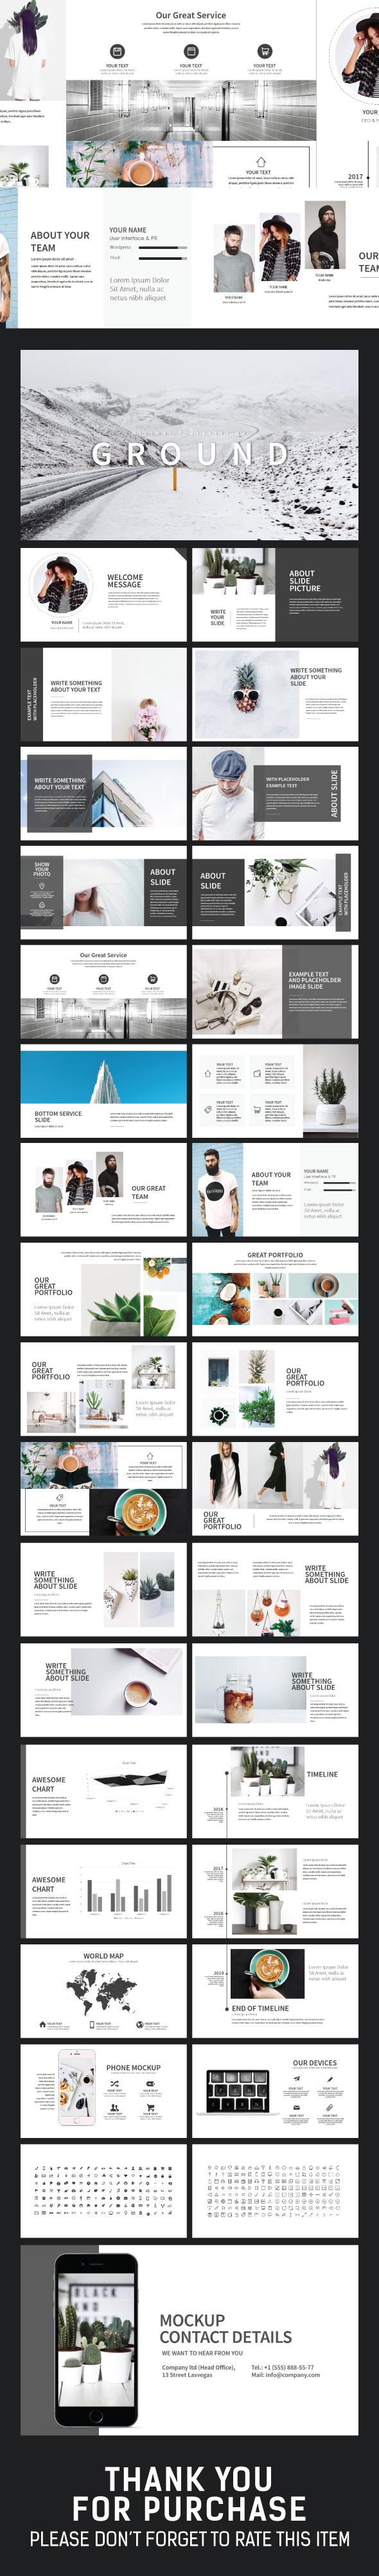 Ground Minimal Presentation - Creative PowerPoint Templates